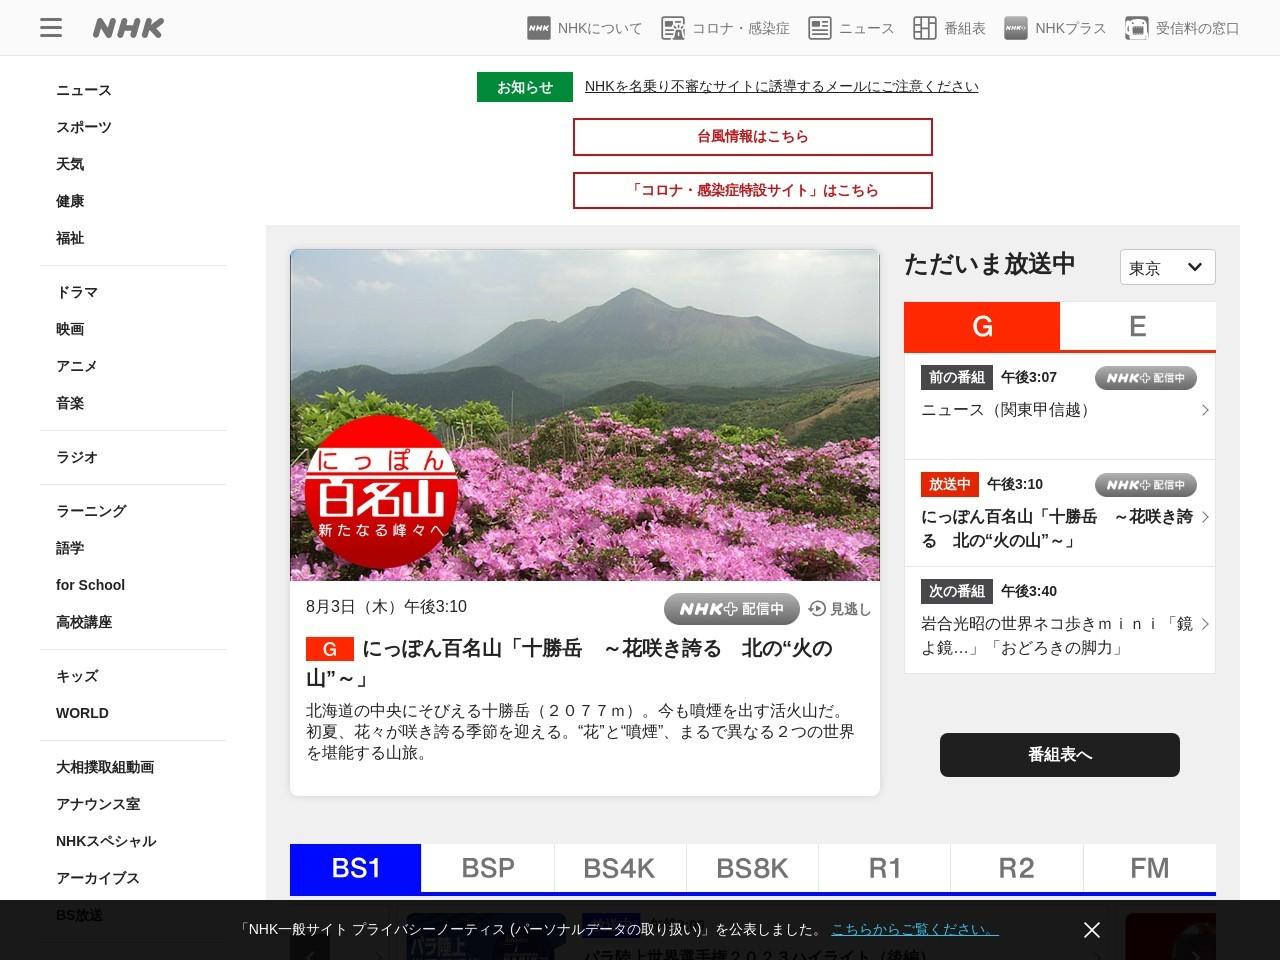 http://www.nhk.or.jp/tamashii/file/115.html